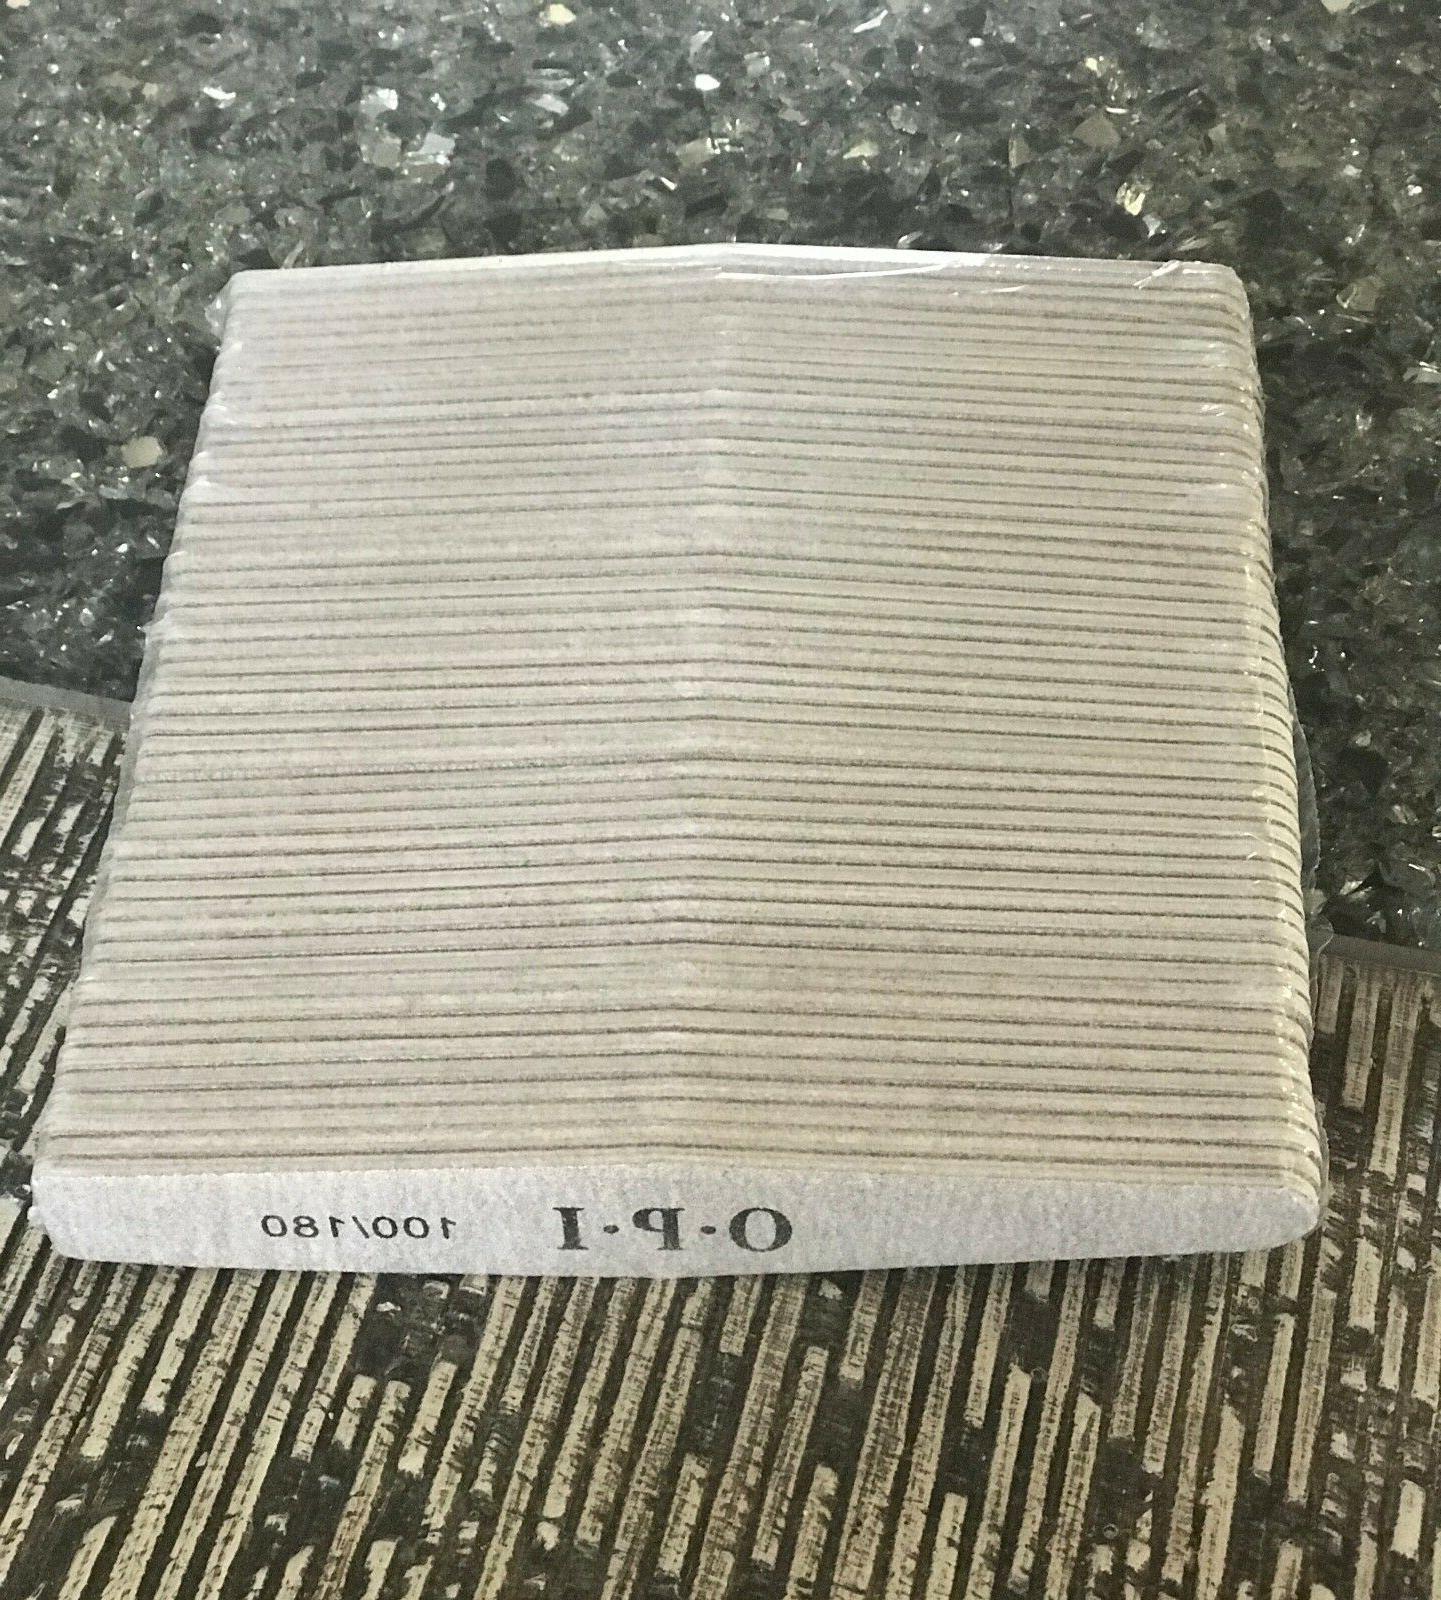 OPI ACR UV Gel GRIT 100/180 Professional NEW